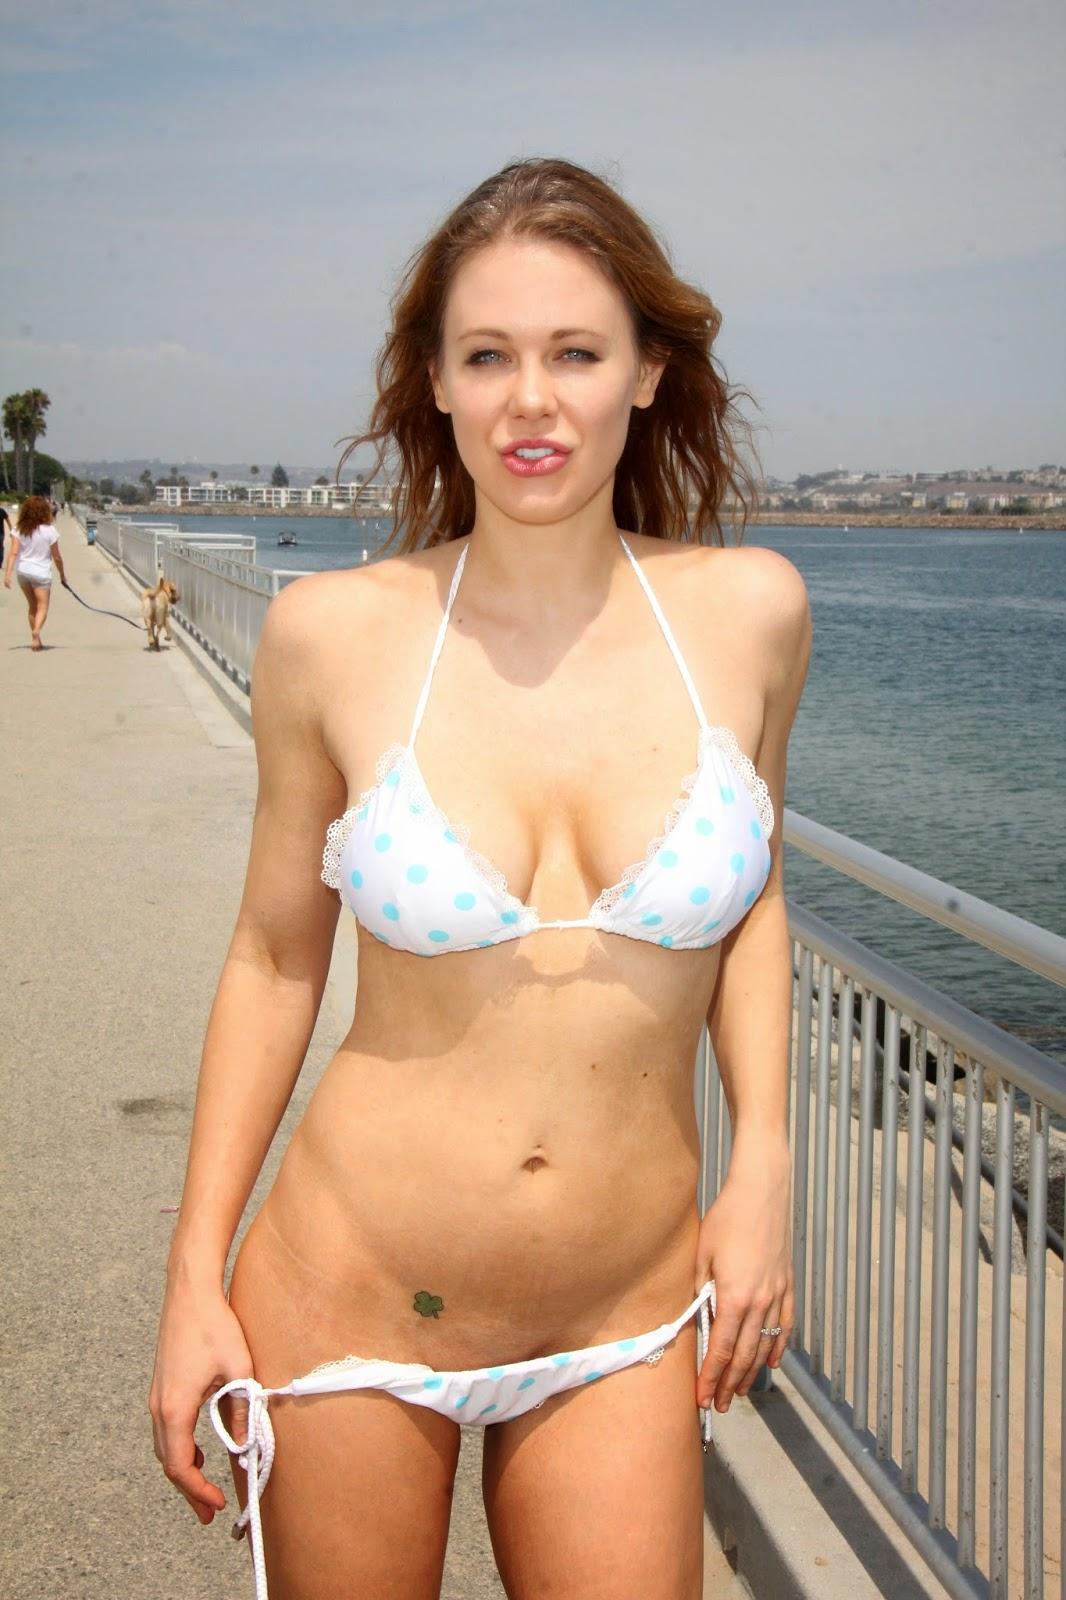 Aj Lee Bikini Images